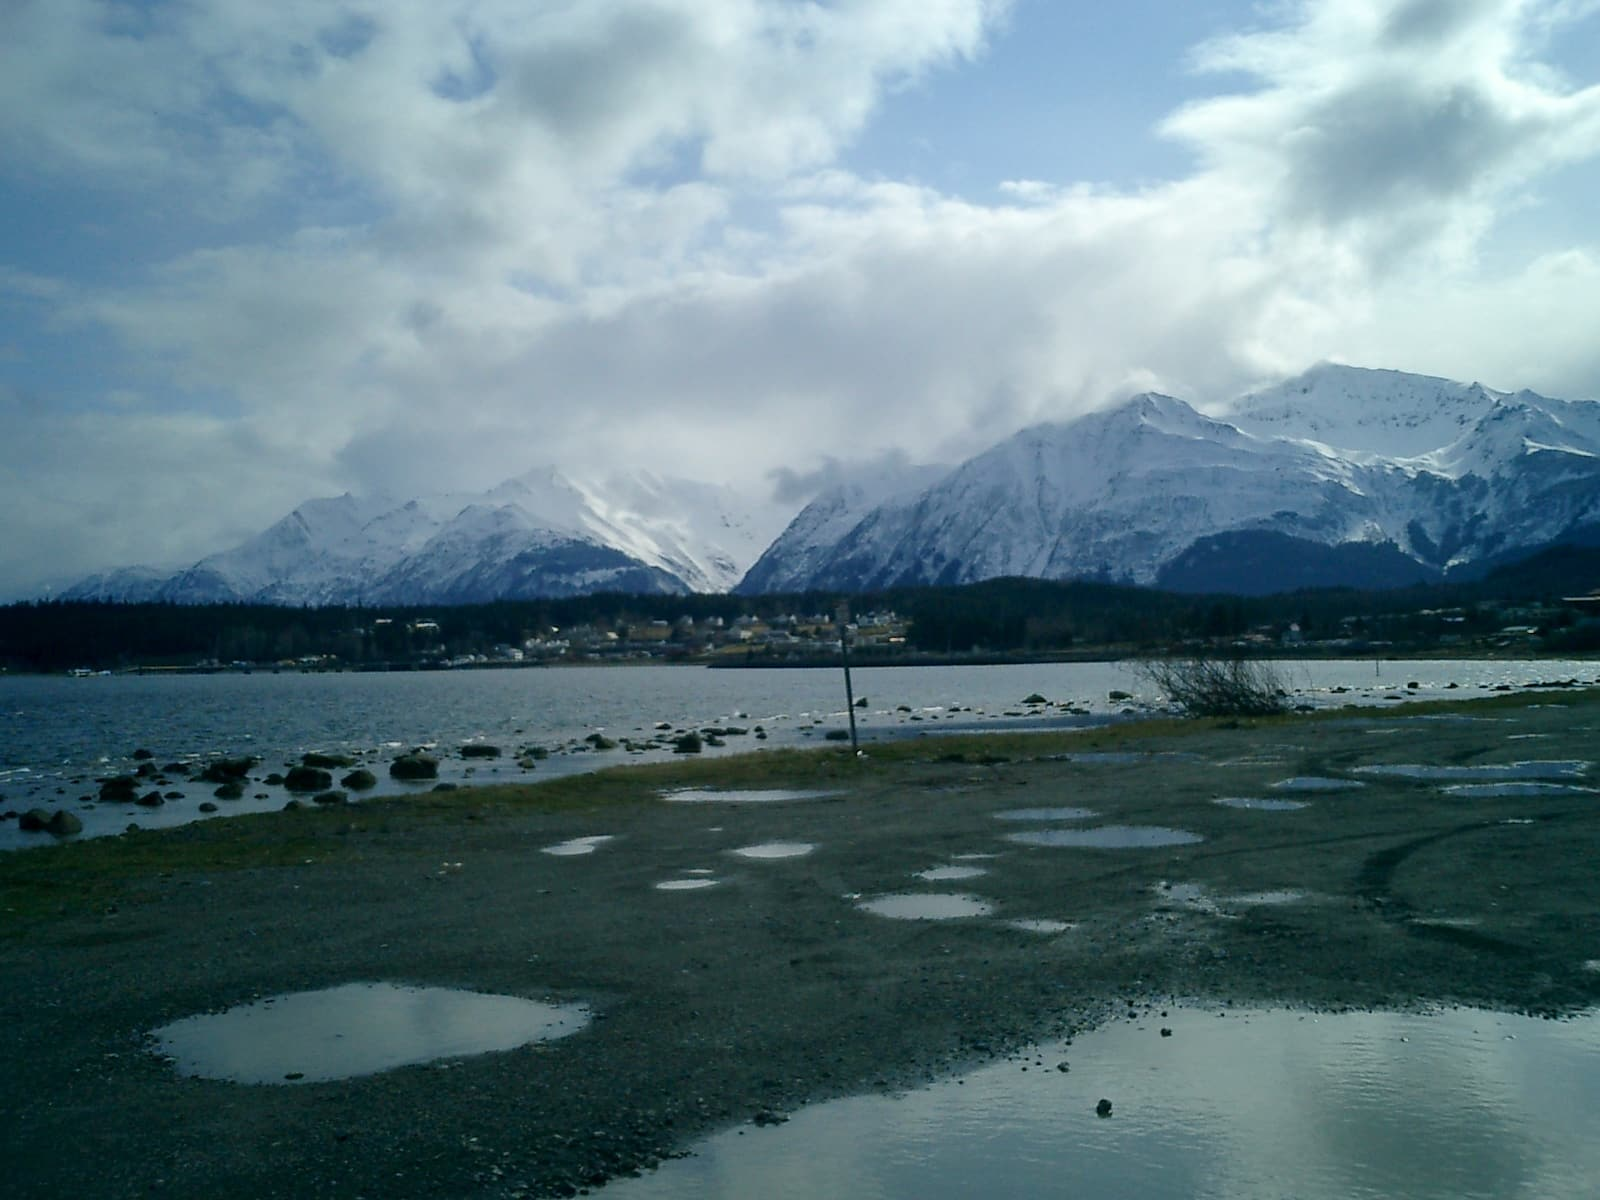 Mount Riley, Alaska, Guided Hiking Tour